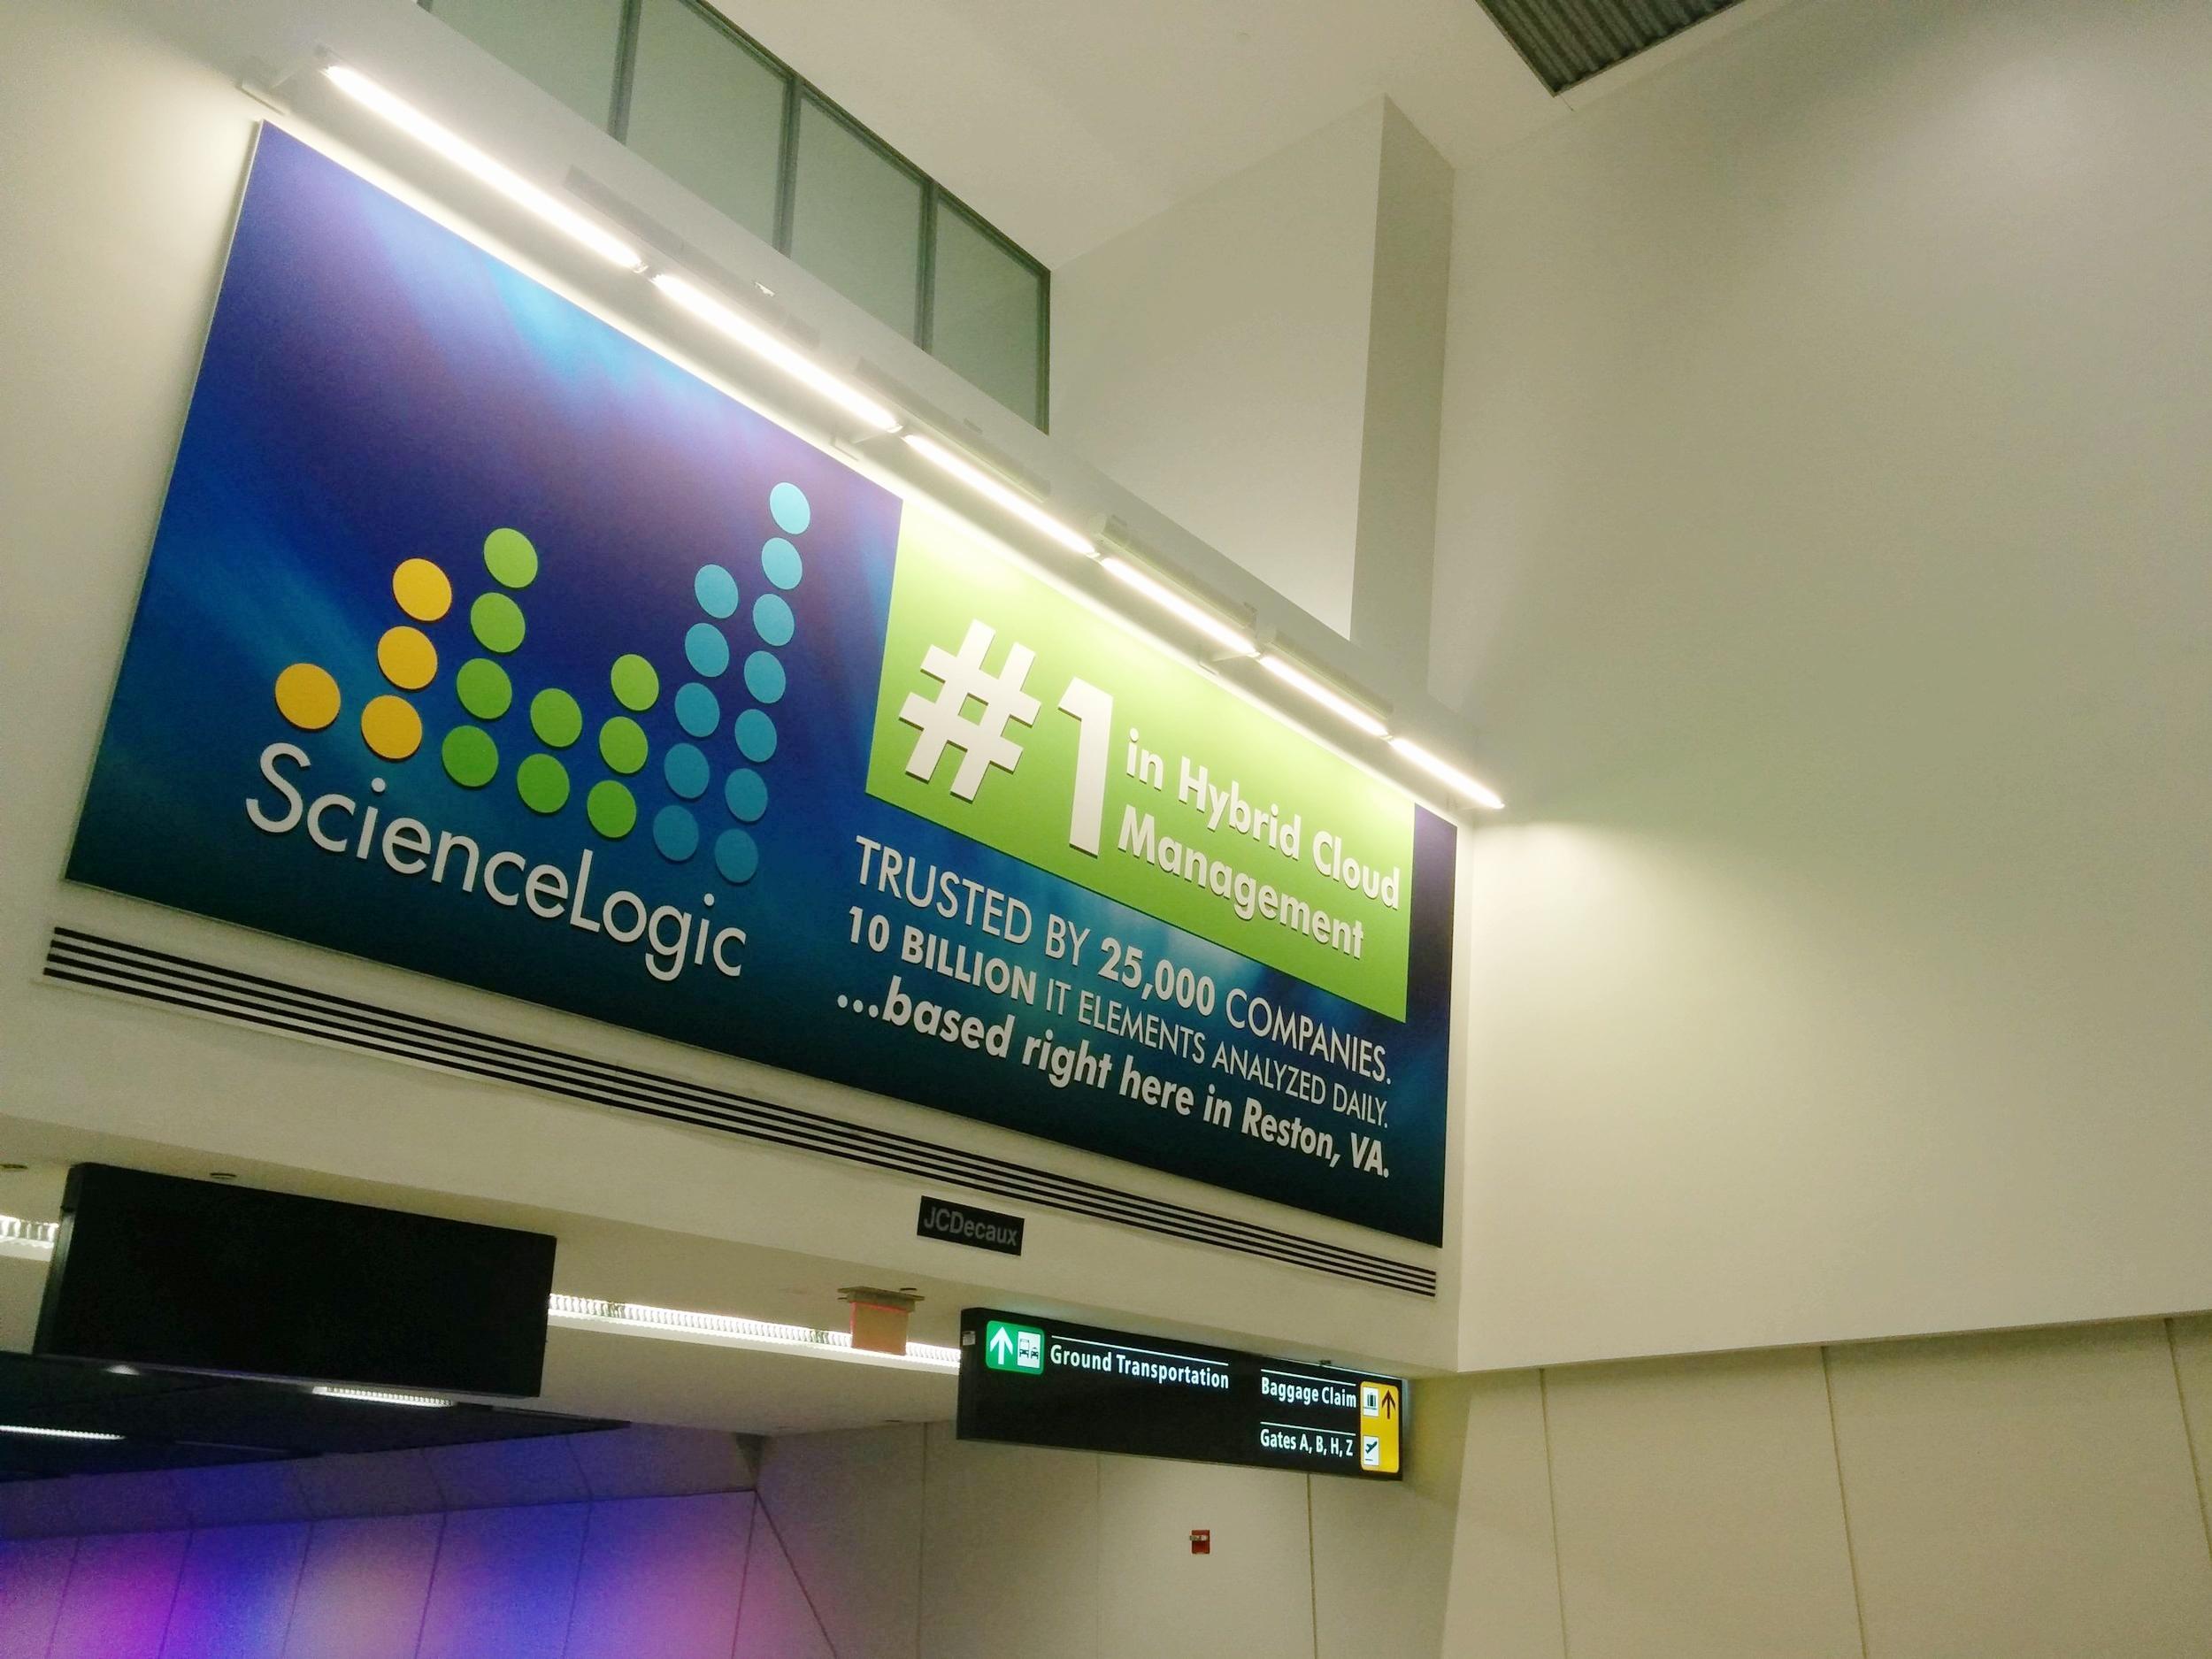 Dulles International Airport